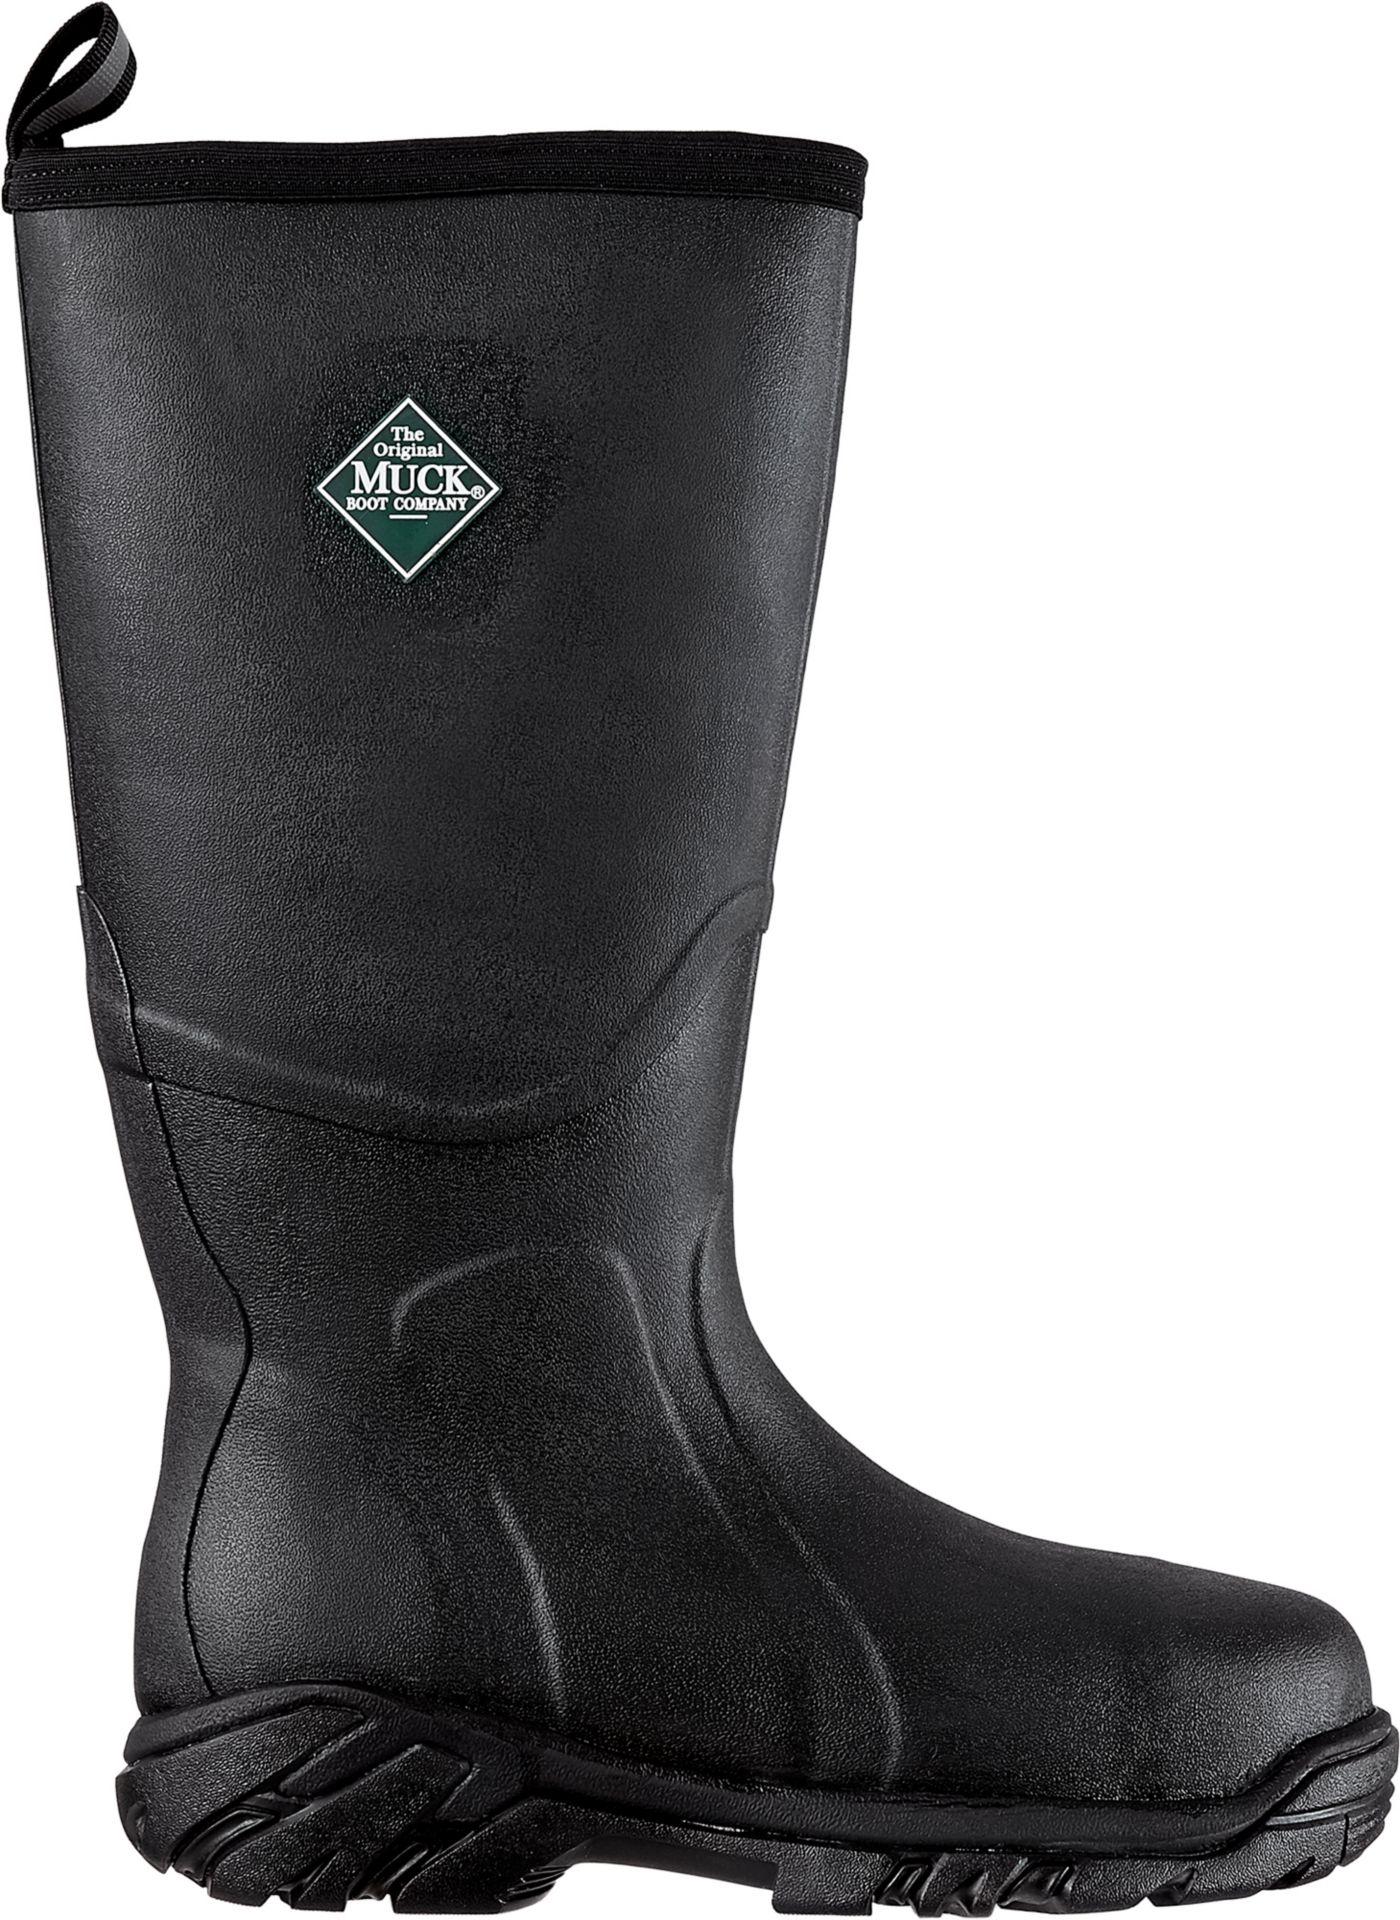 Muck Boots Men's Arctic Extreme Waterproof Composite Toe Work Boots